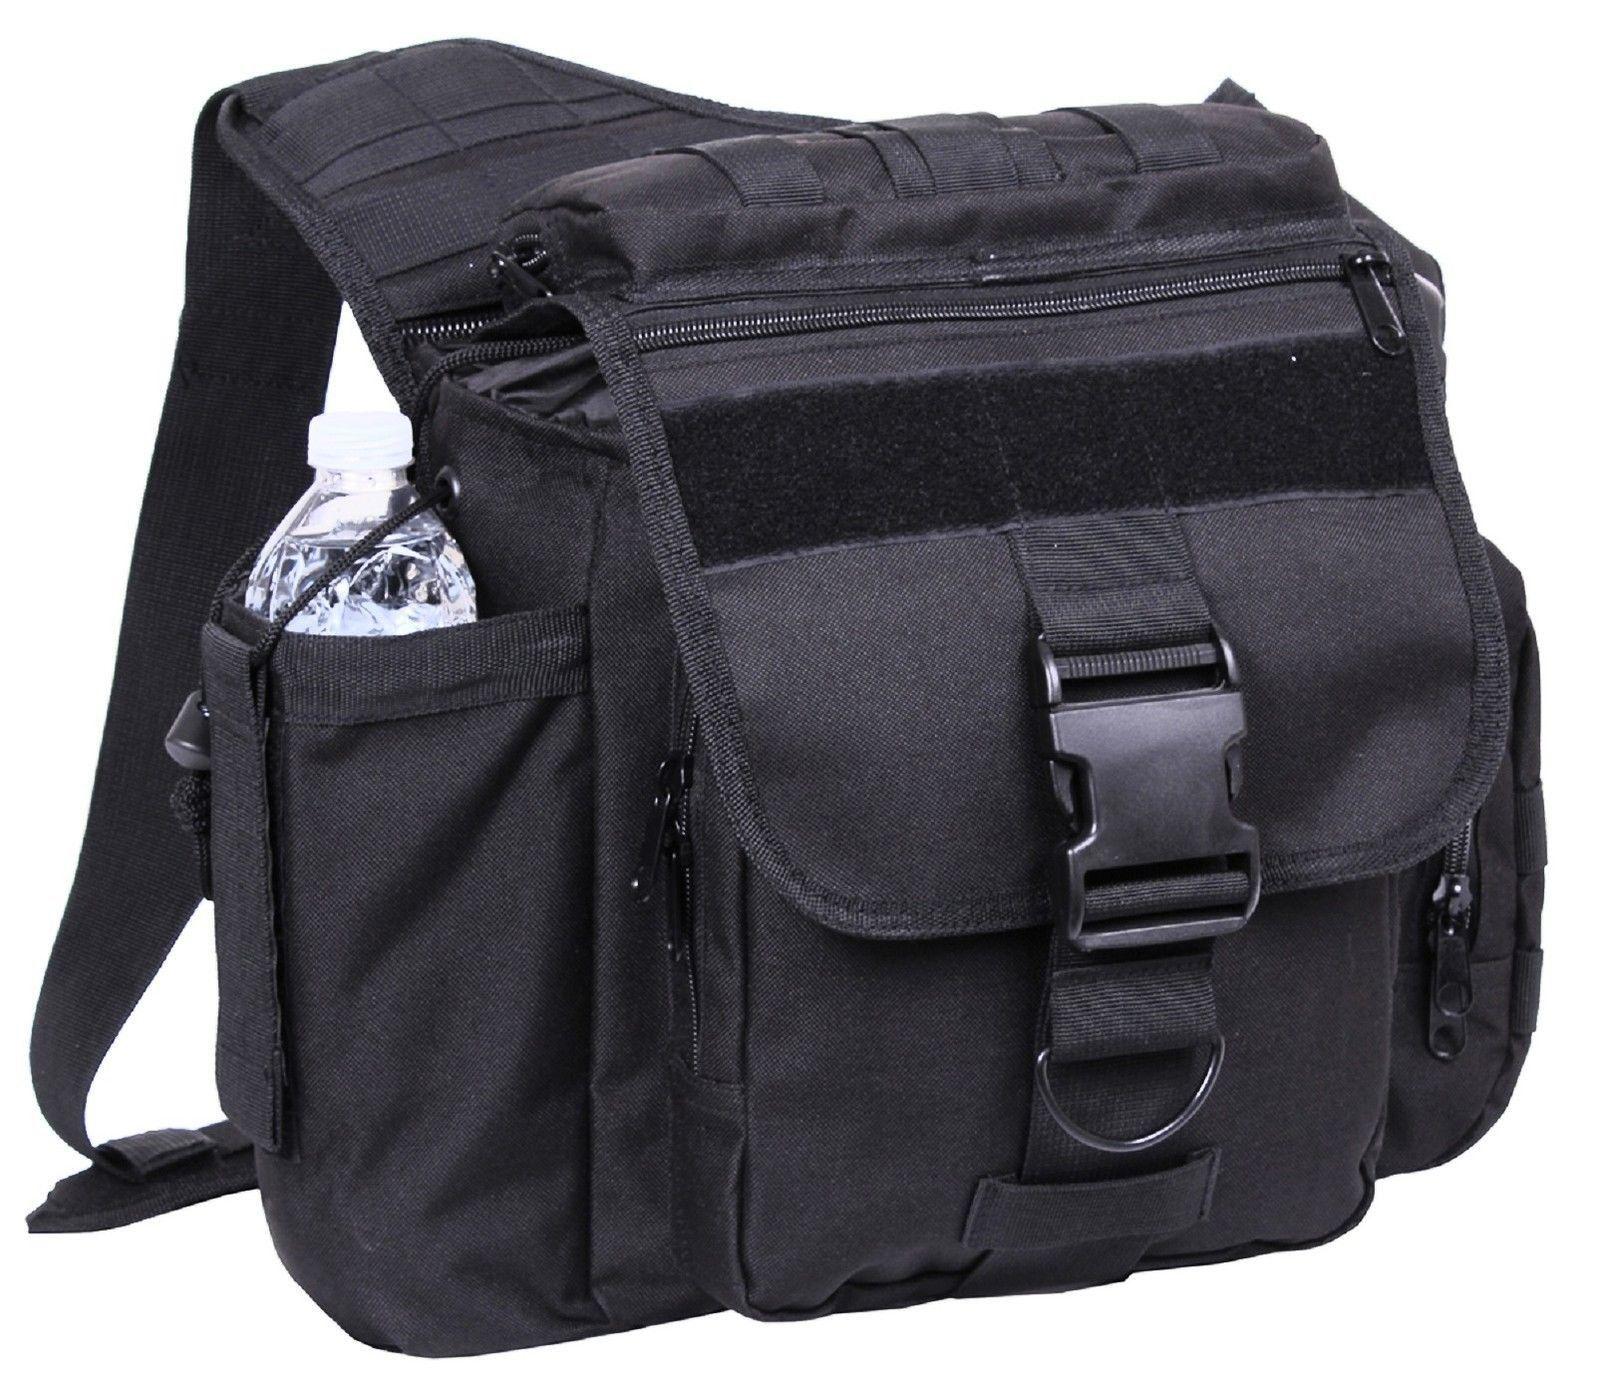 Rothco XL Advanced Tactical Shoulder Bag - Black or Brown Single Strap Pack